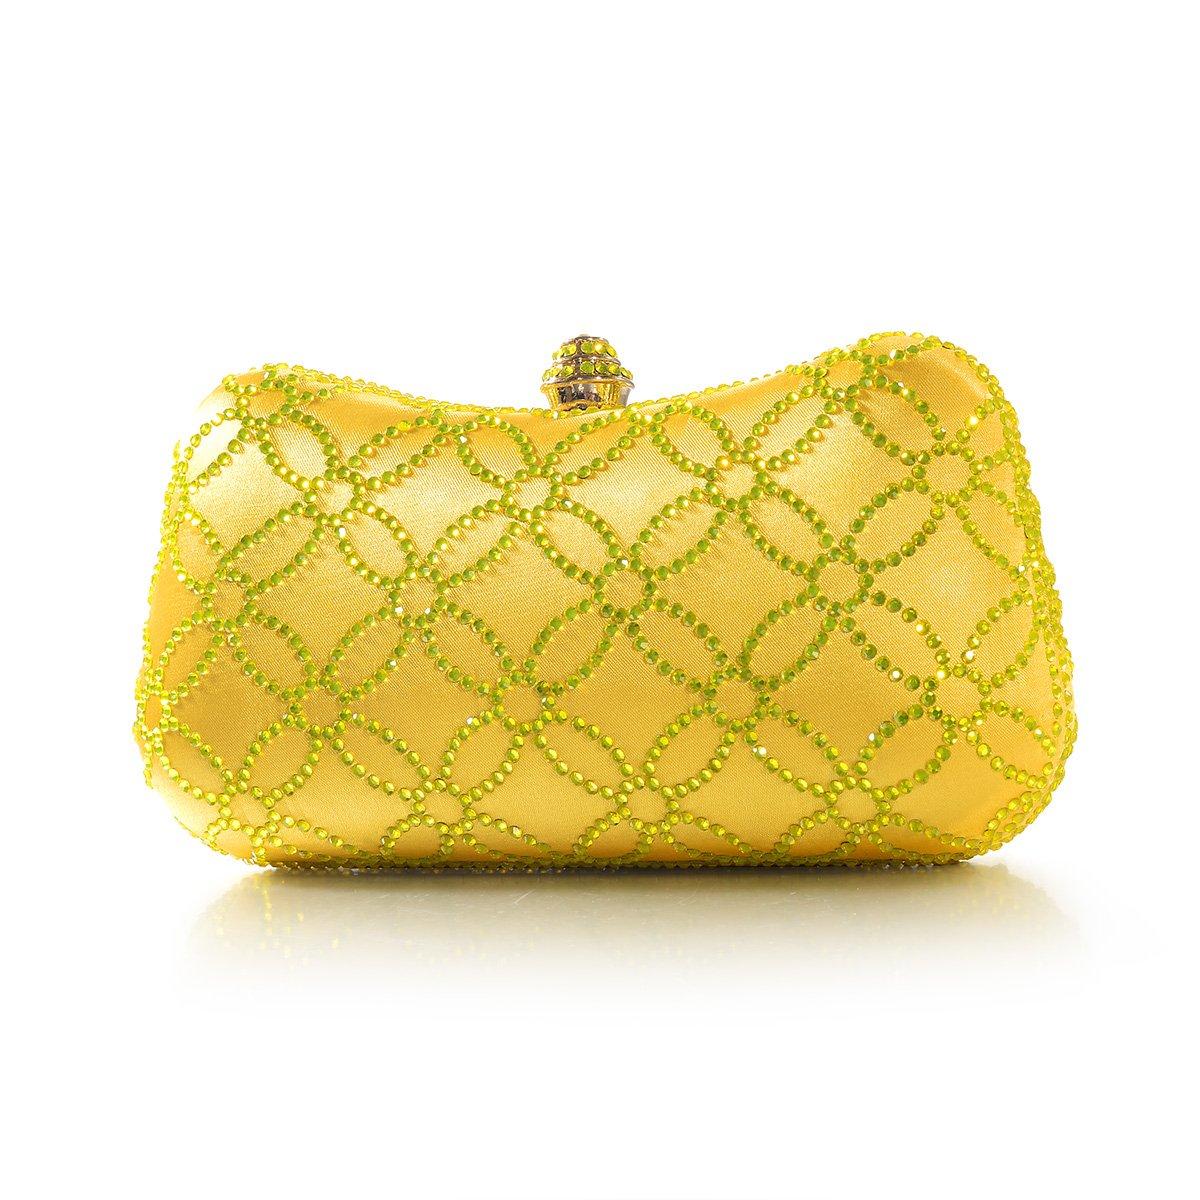 DMIX Women Clutch Purse Hard Case Shiny Evening Bag Glitter Handbag With Chain Strap Yellow